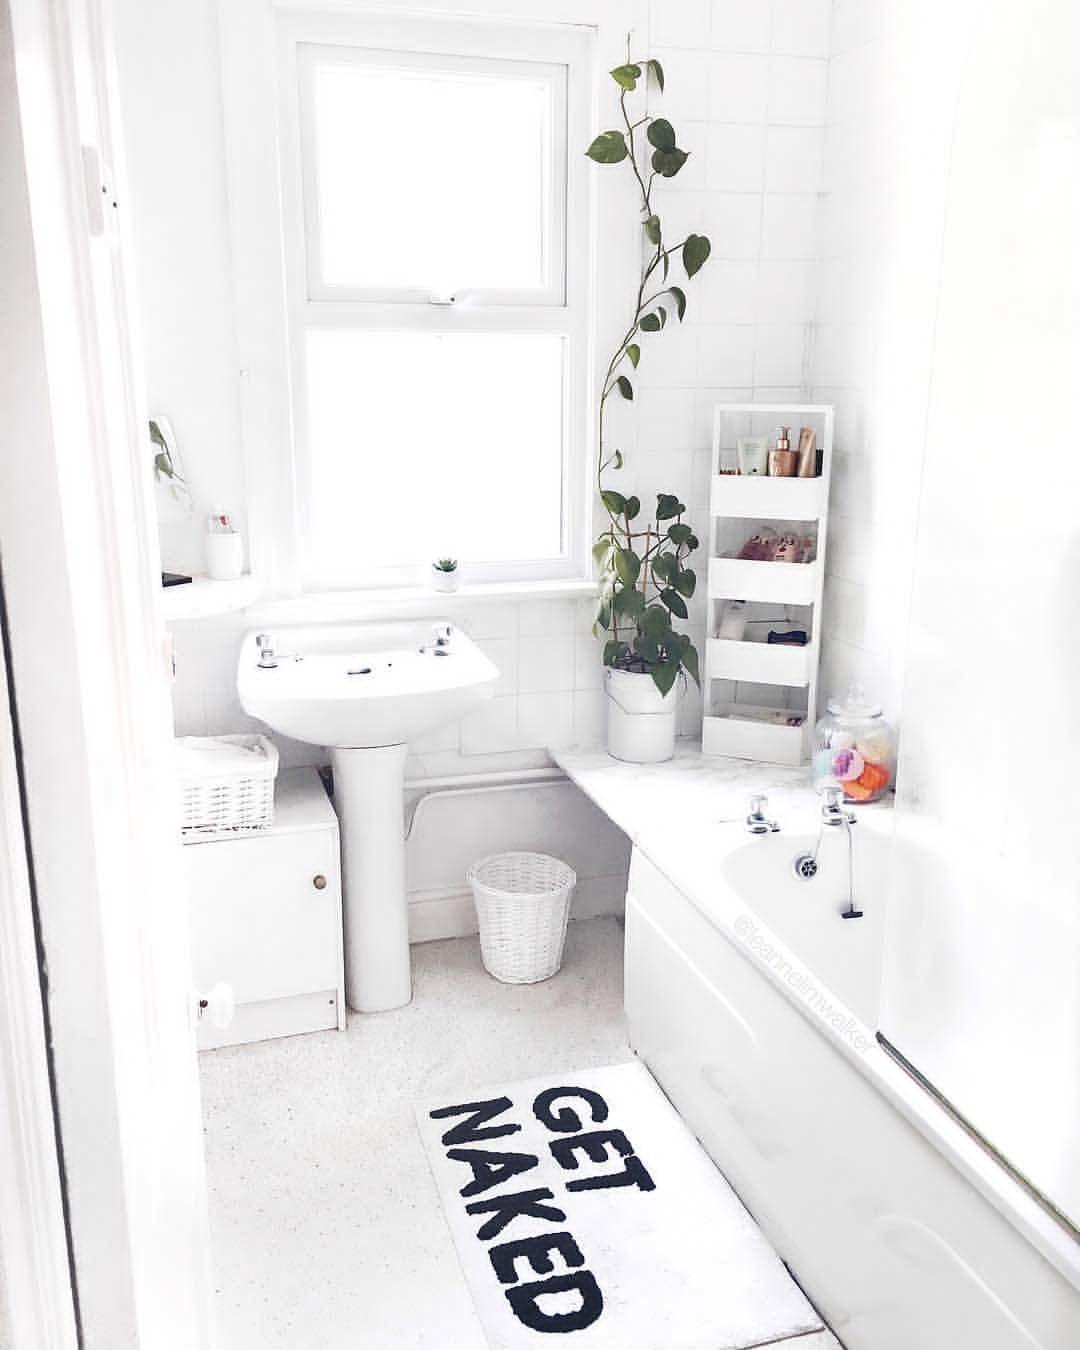 https://www.urbanoutfitters.com/search?q=bath+